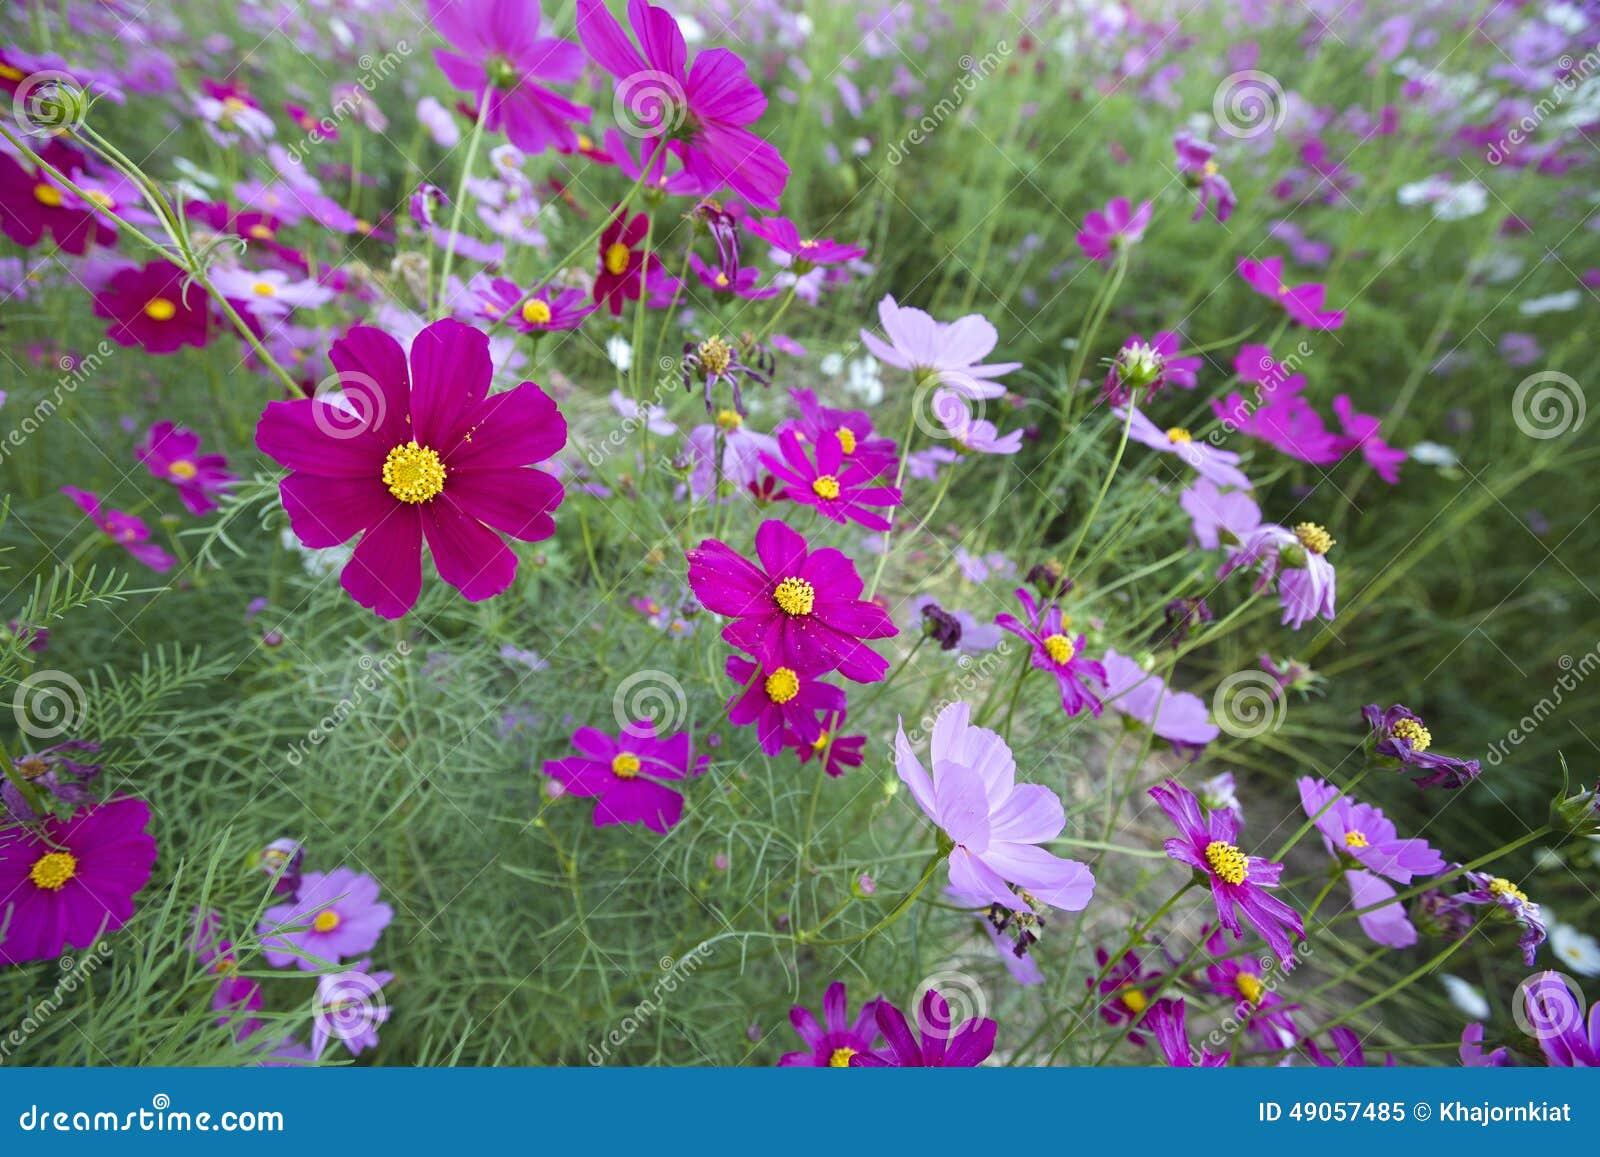 Cosmos flowers stock image image of flower single softness 49057485 royalty free stock photo izmirmasajfo Gallery